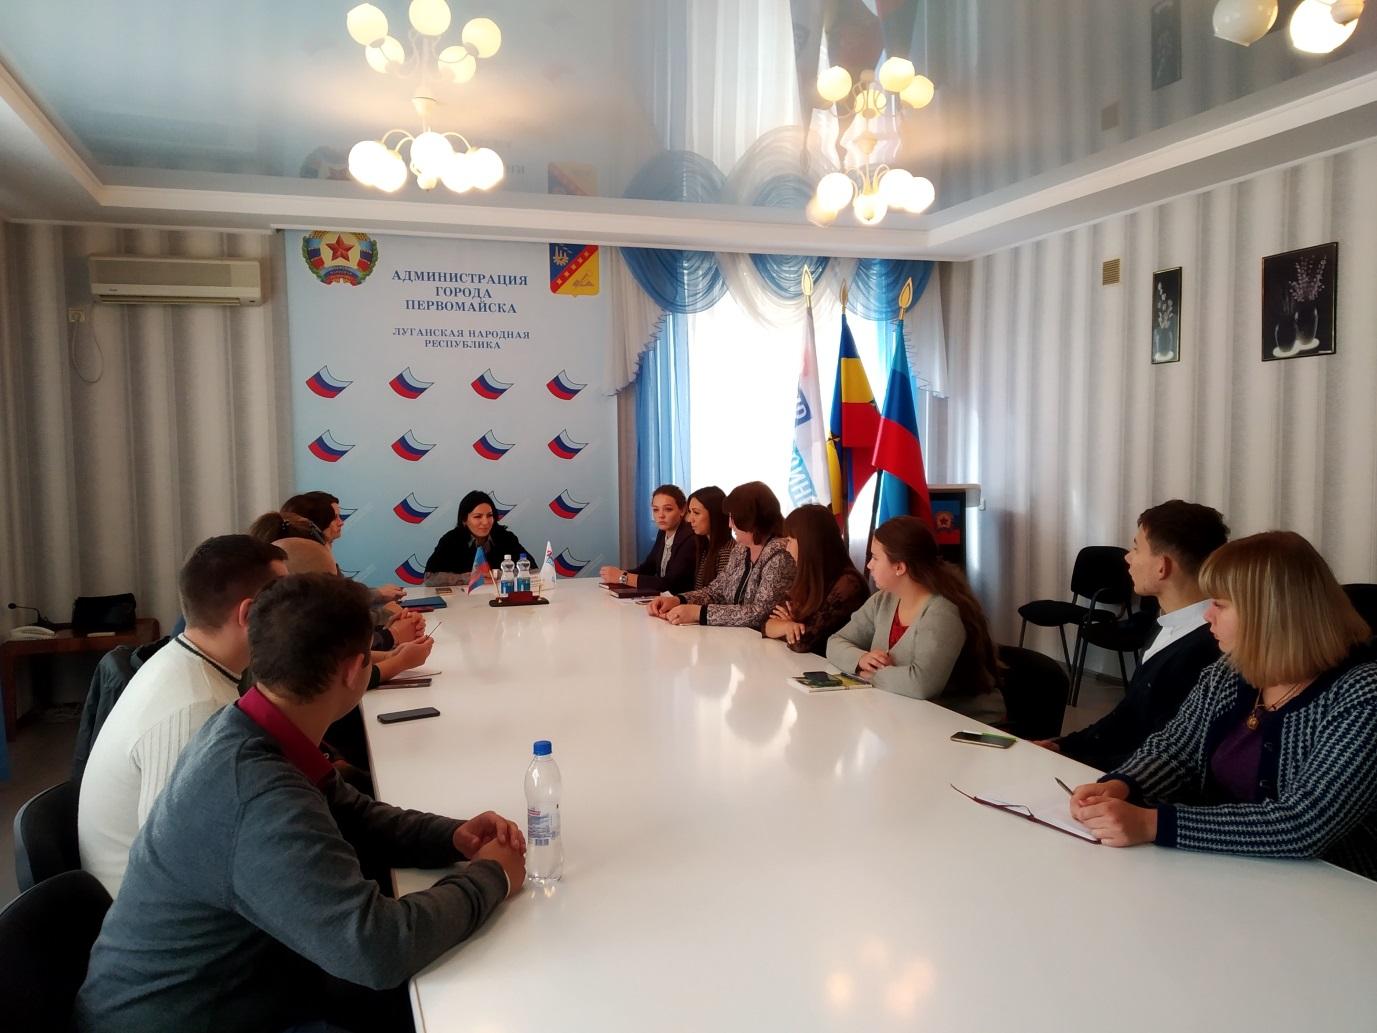 Елена Фарахова провела встречу с молодежью в Первомайске 1